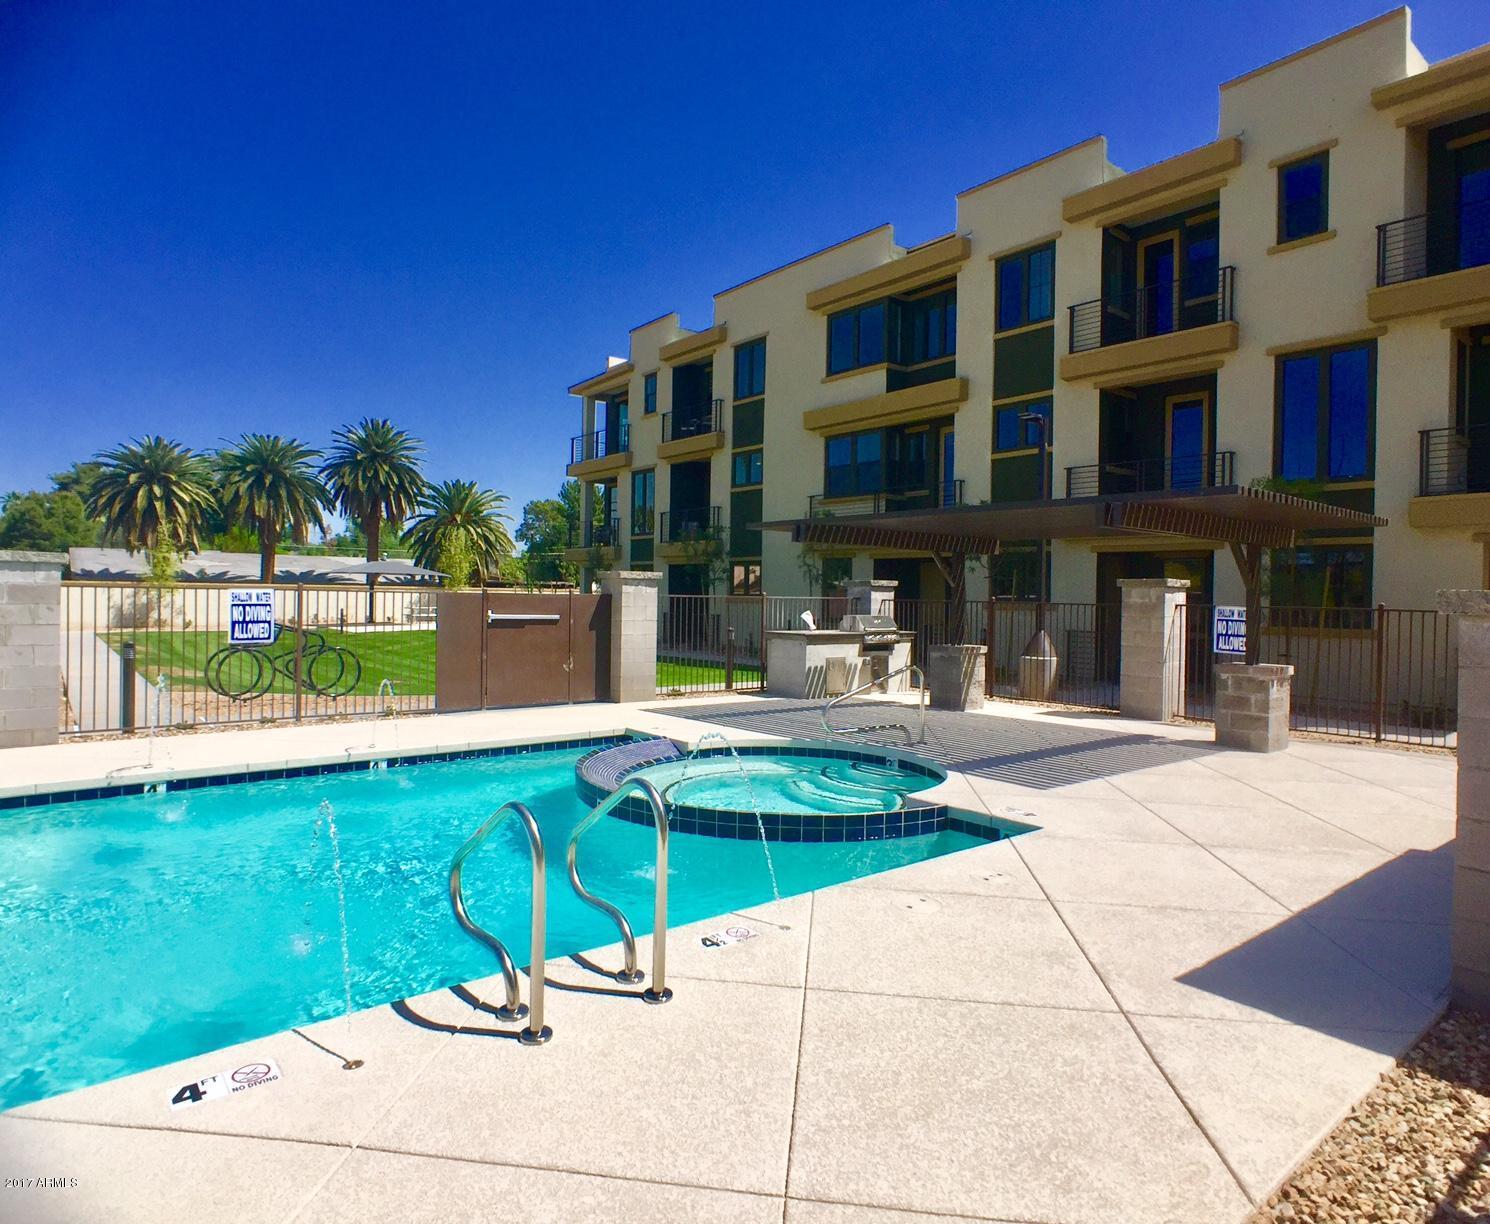 4236 N 27TH Street, 36, Phoenix, AZ 85016